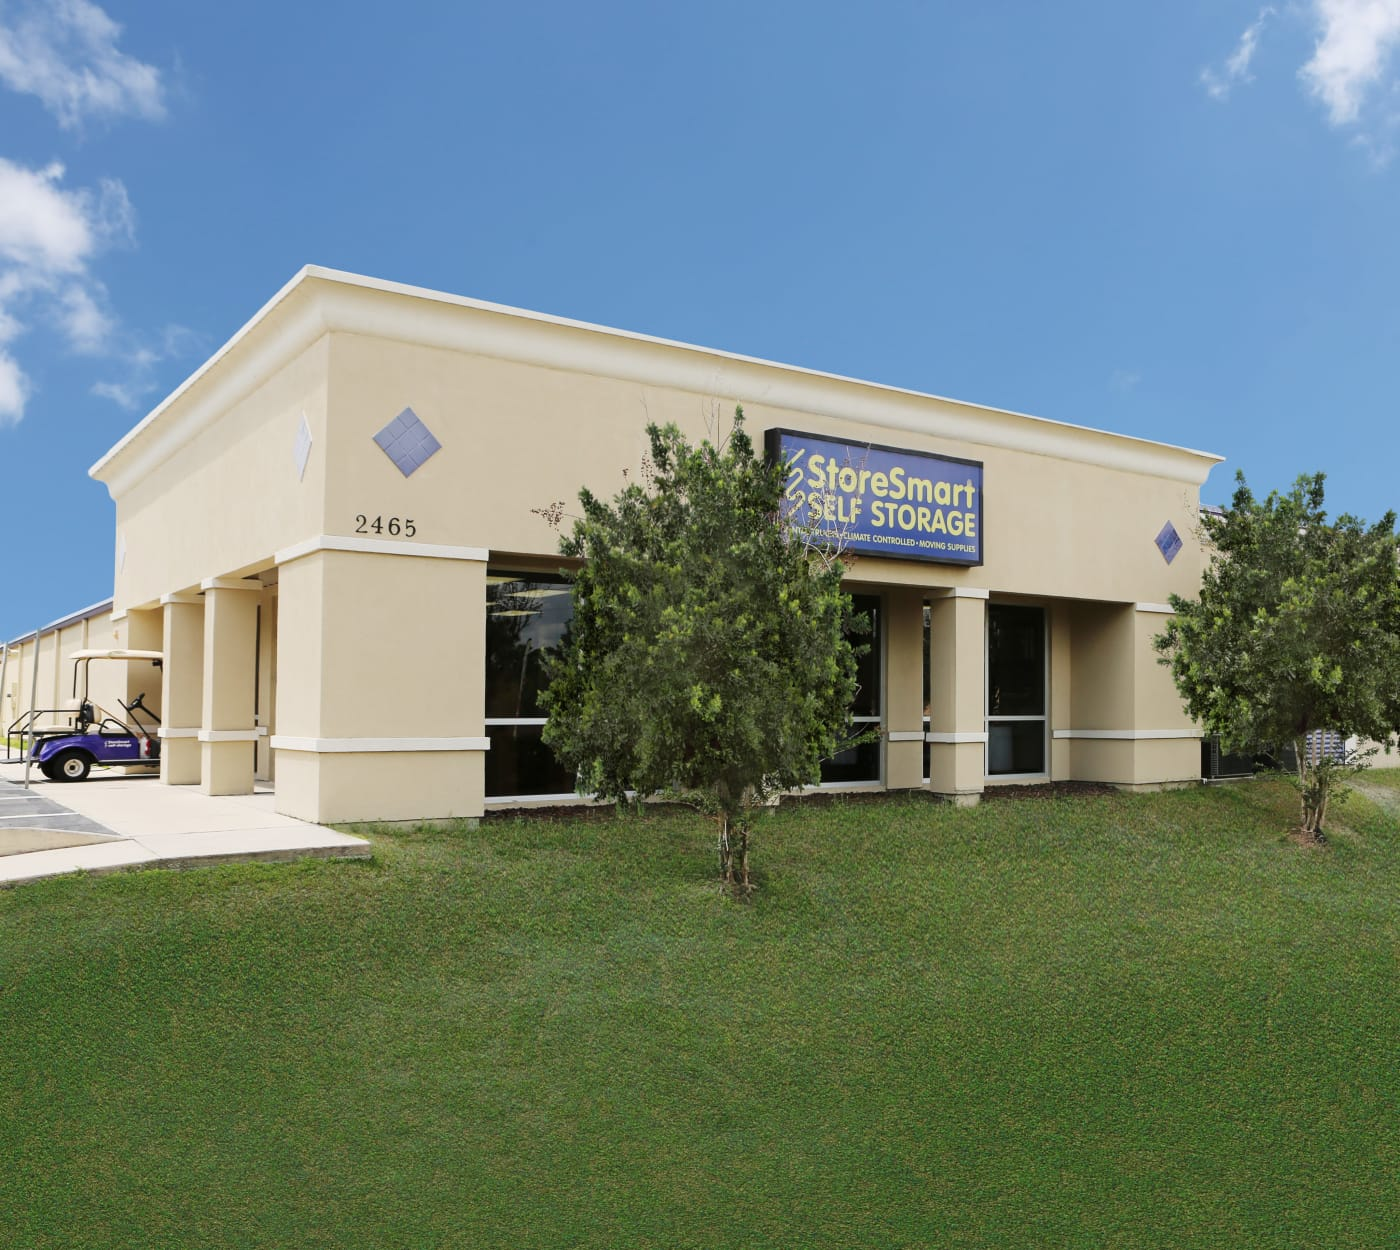 Entrance gate at StoreSmart Self-Storage in Spring Hill, Florida